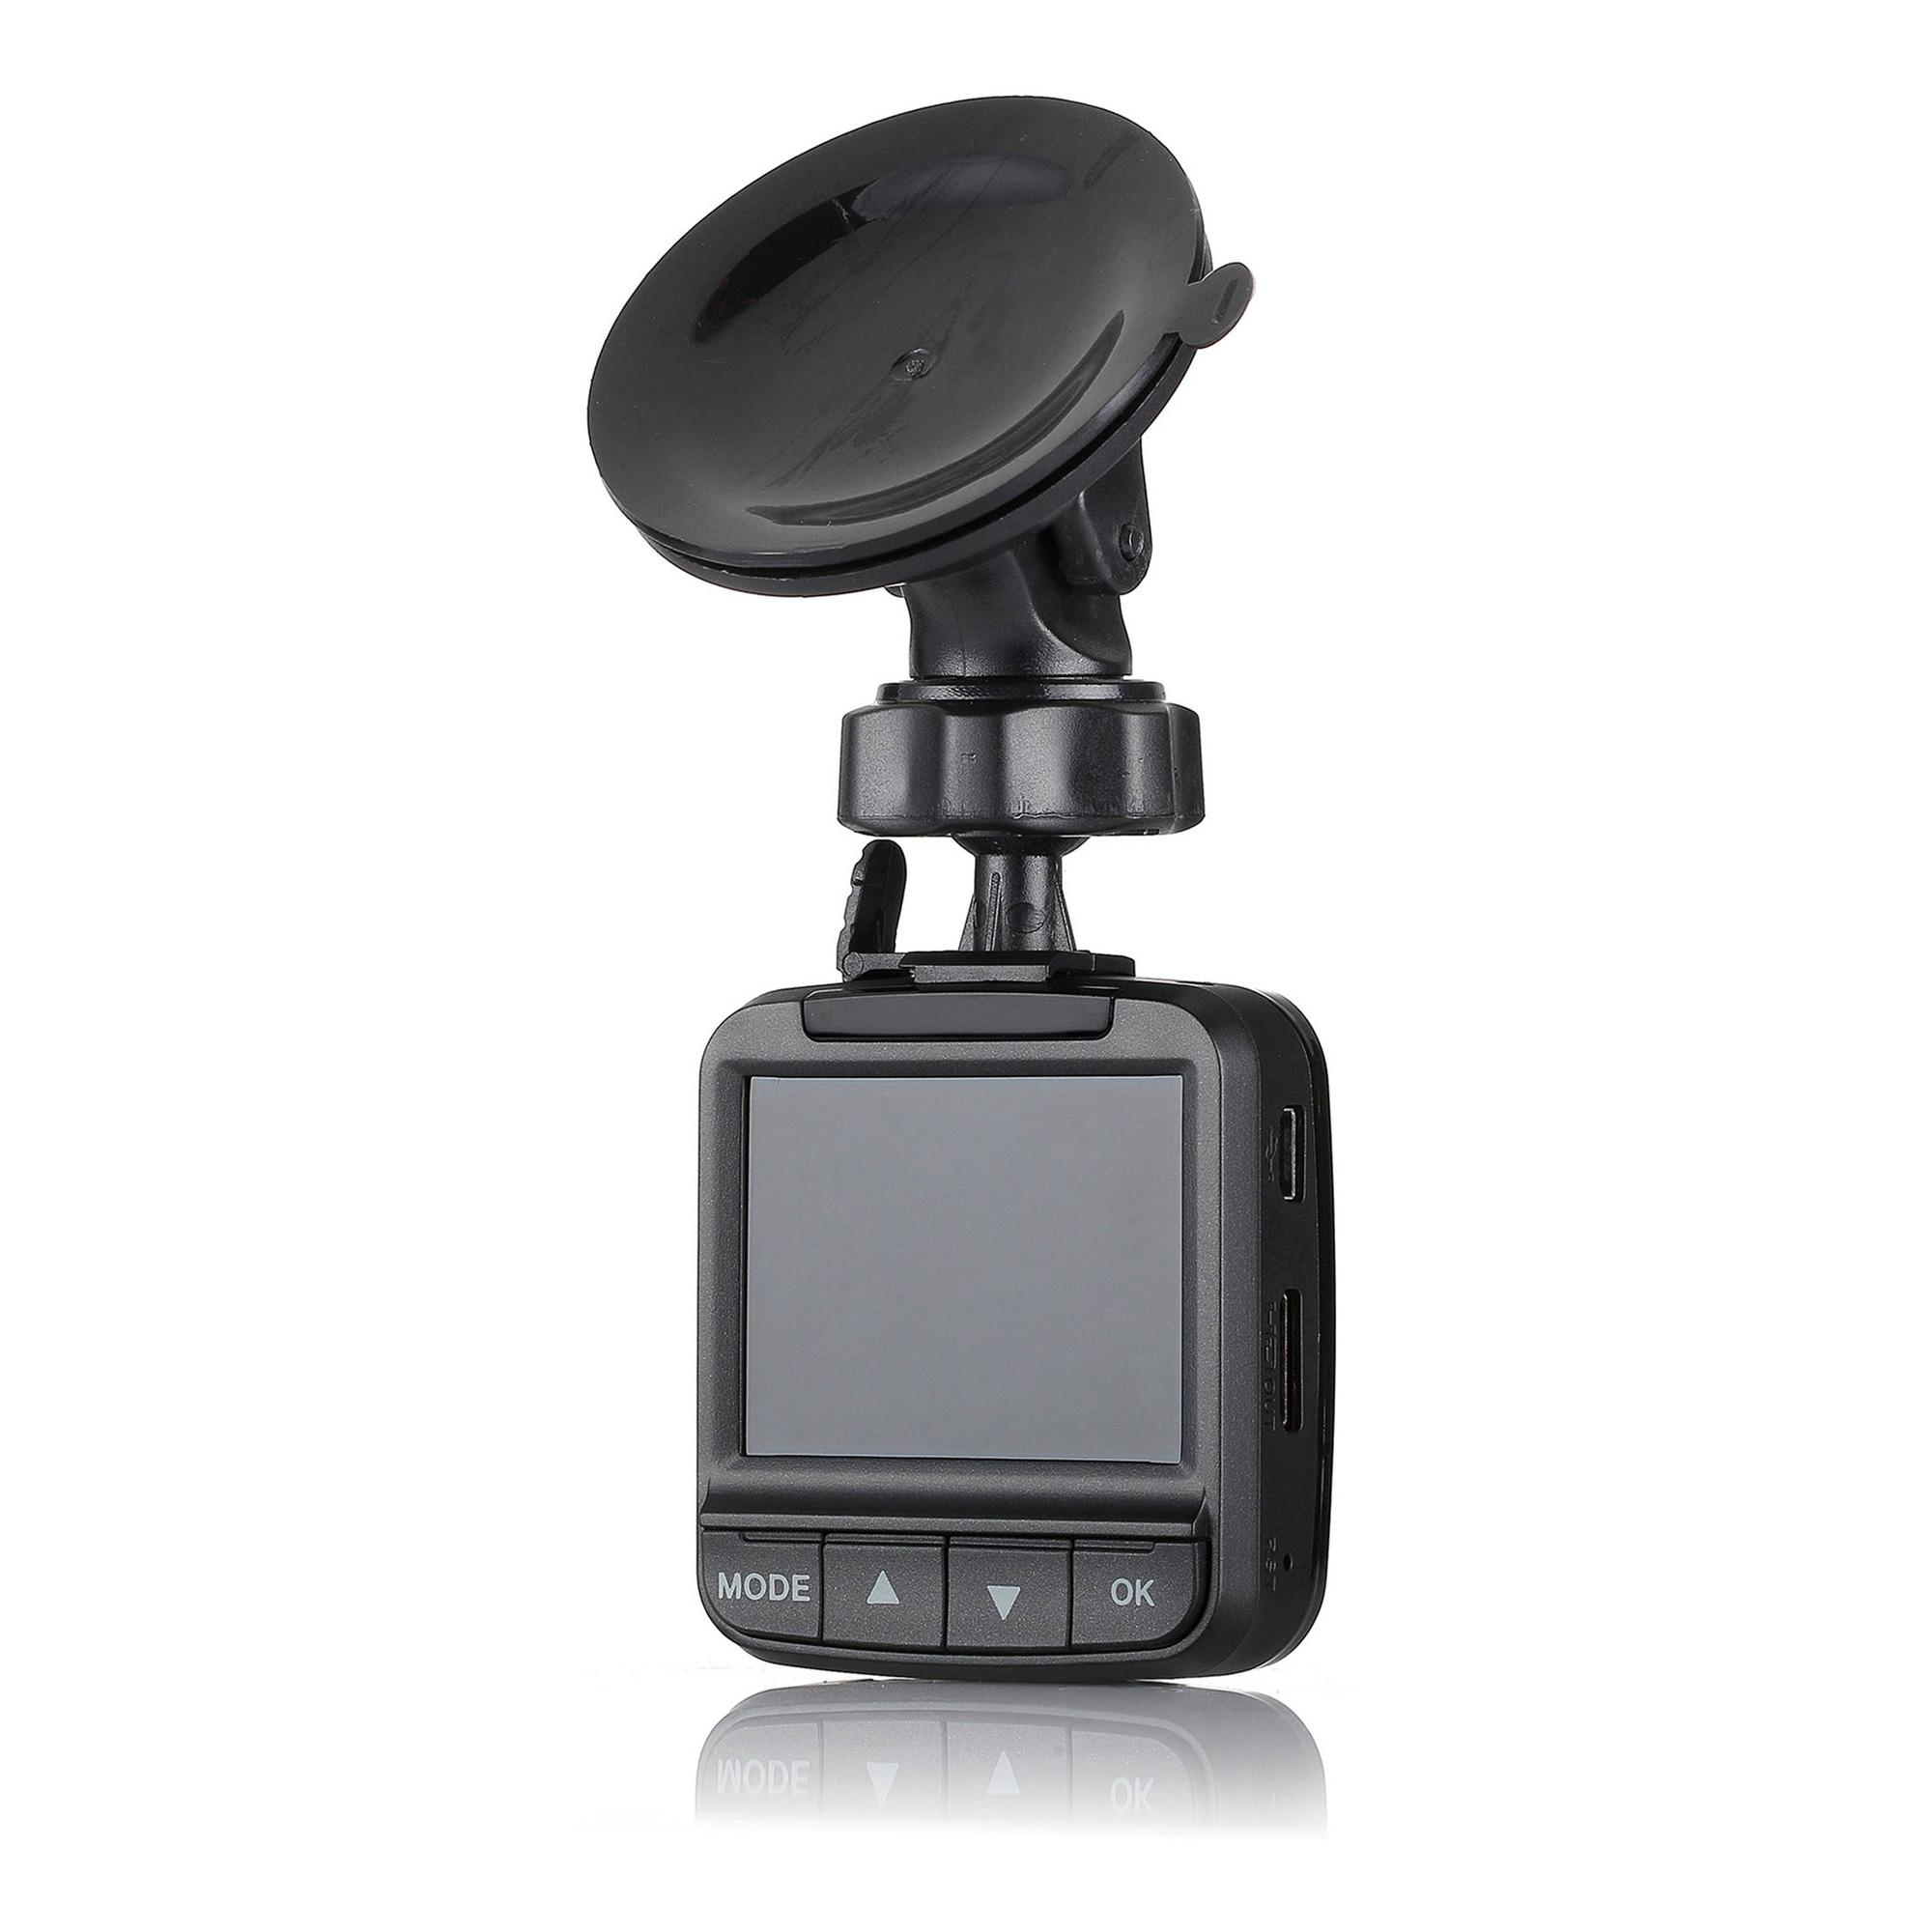 Navigator HD Dash Camera Vehicle Recorder with GPS Tracking